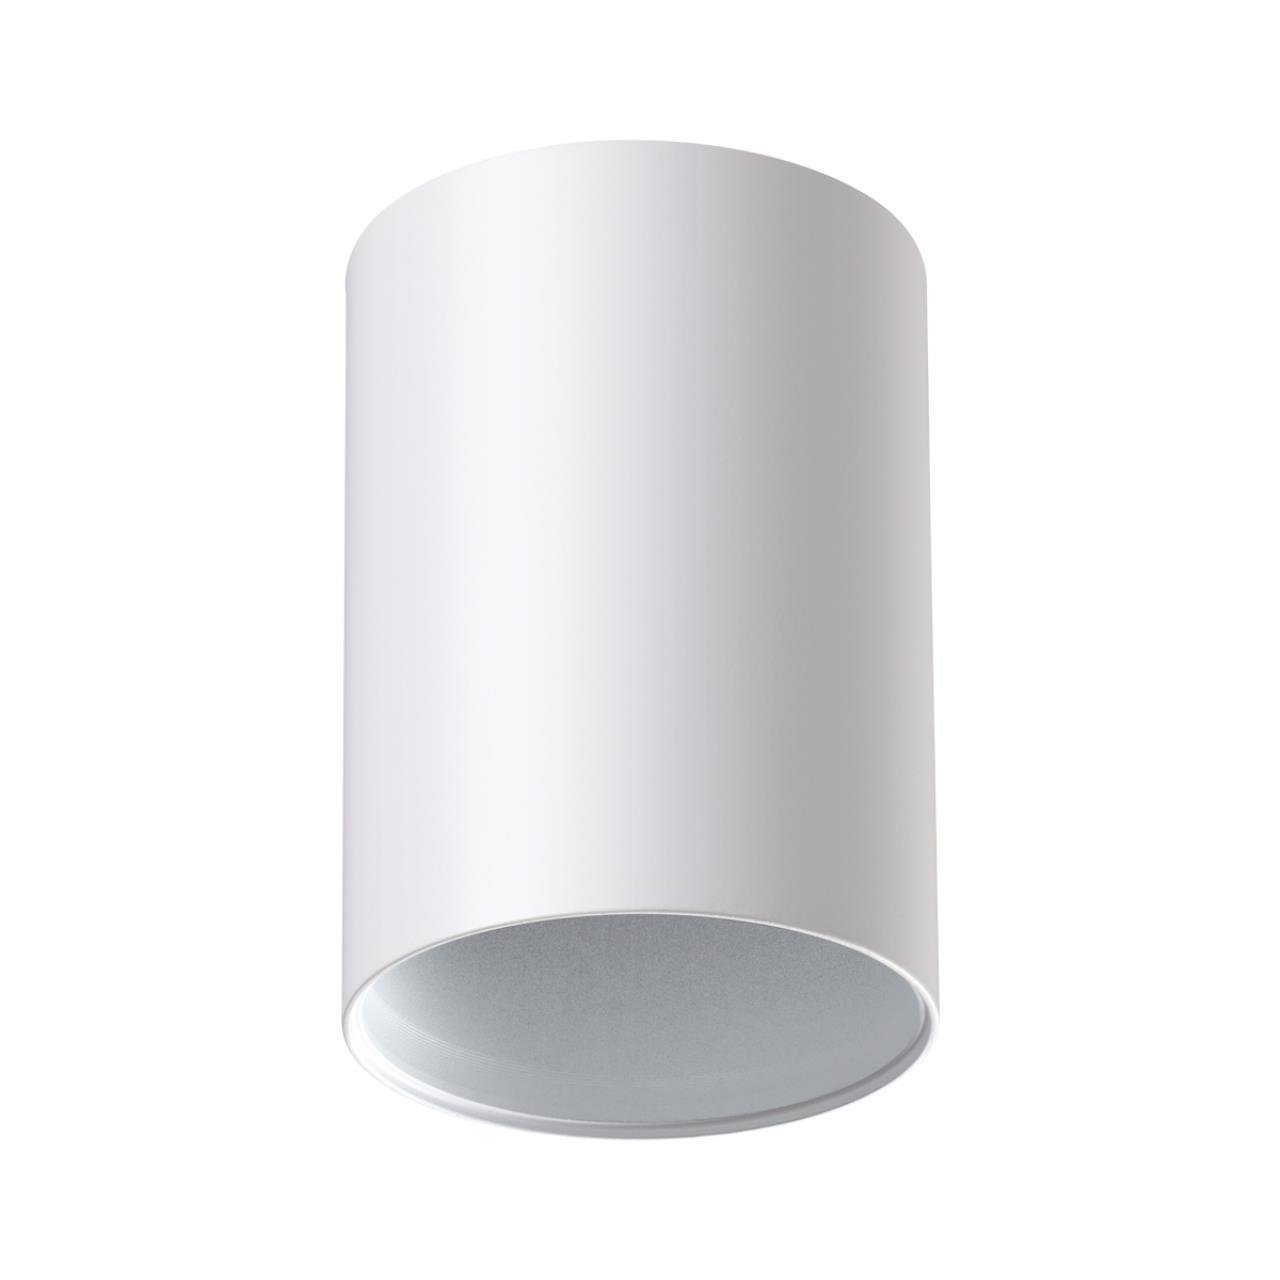 370455 KONST NT19 032 белый Накладной светильник IP20 GU10 50W 220V MECANO